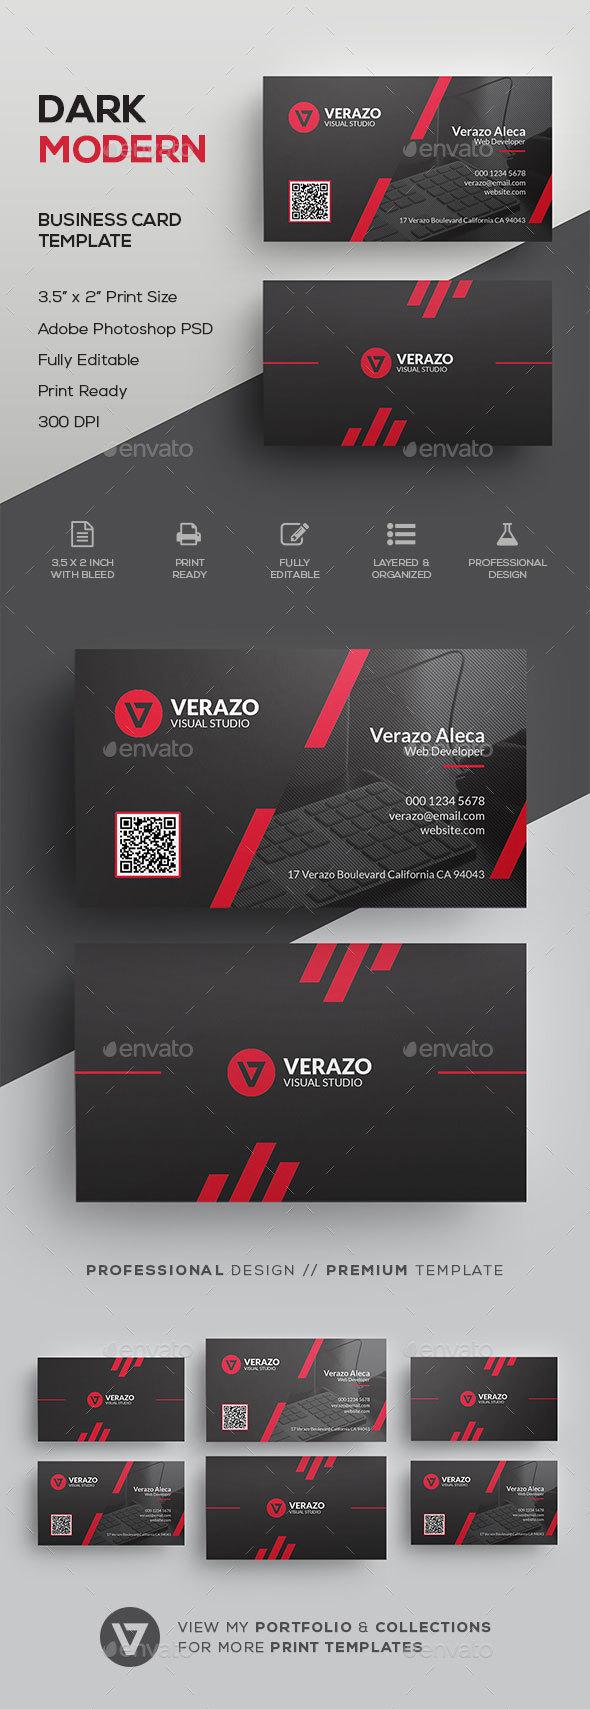 Dark & Modern Corporate Business Card Template - Corporate Business Cards